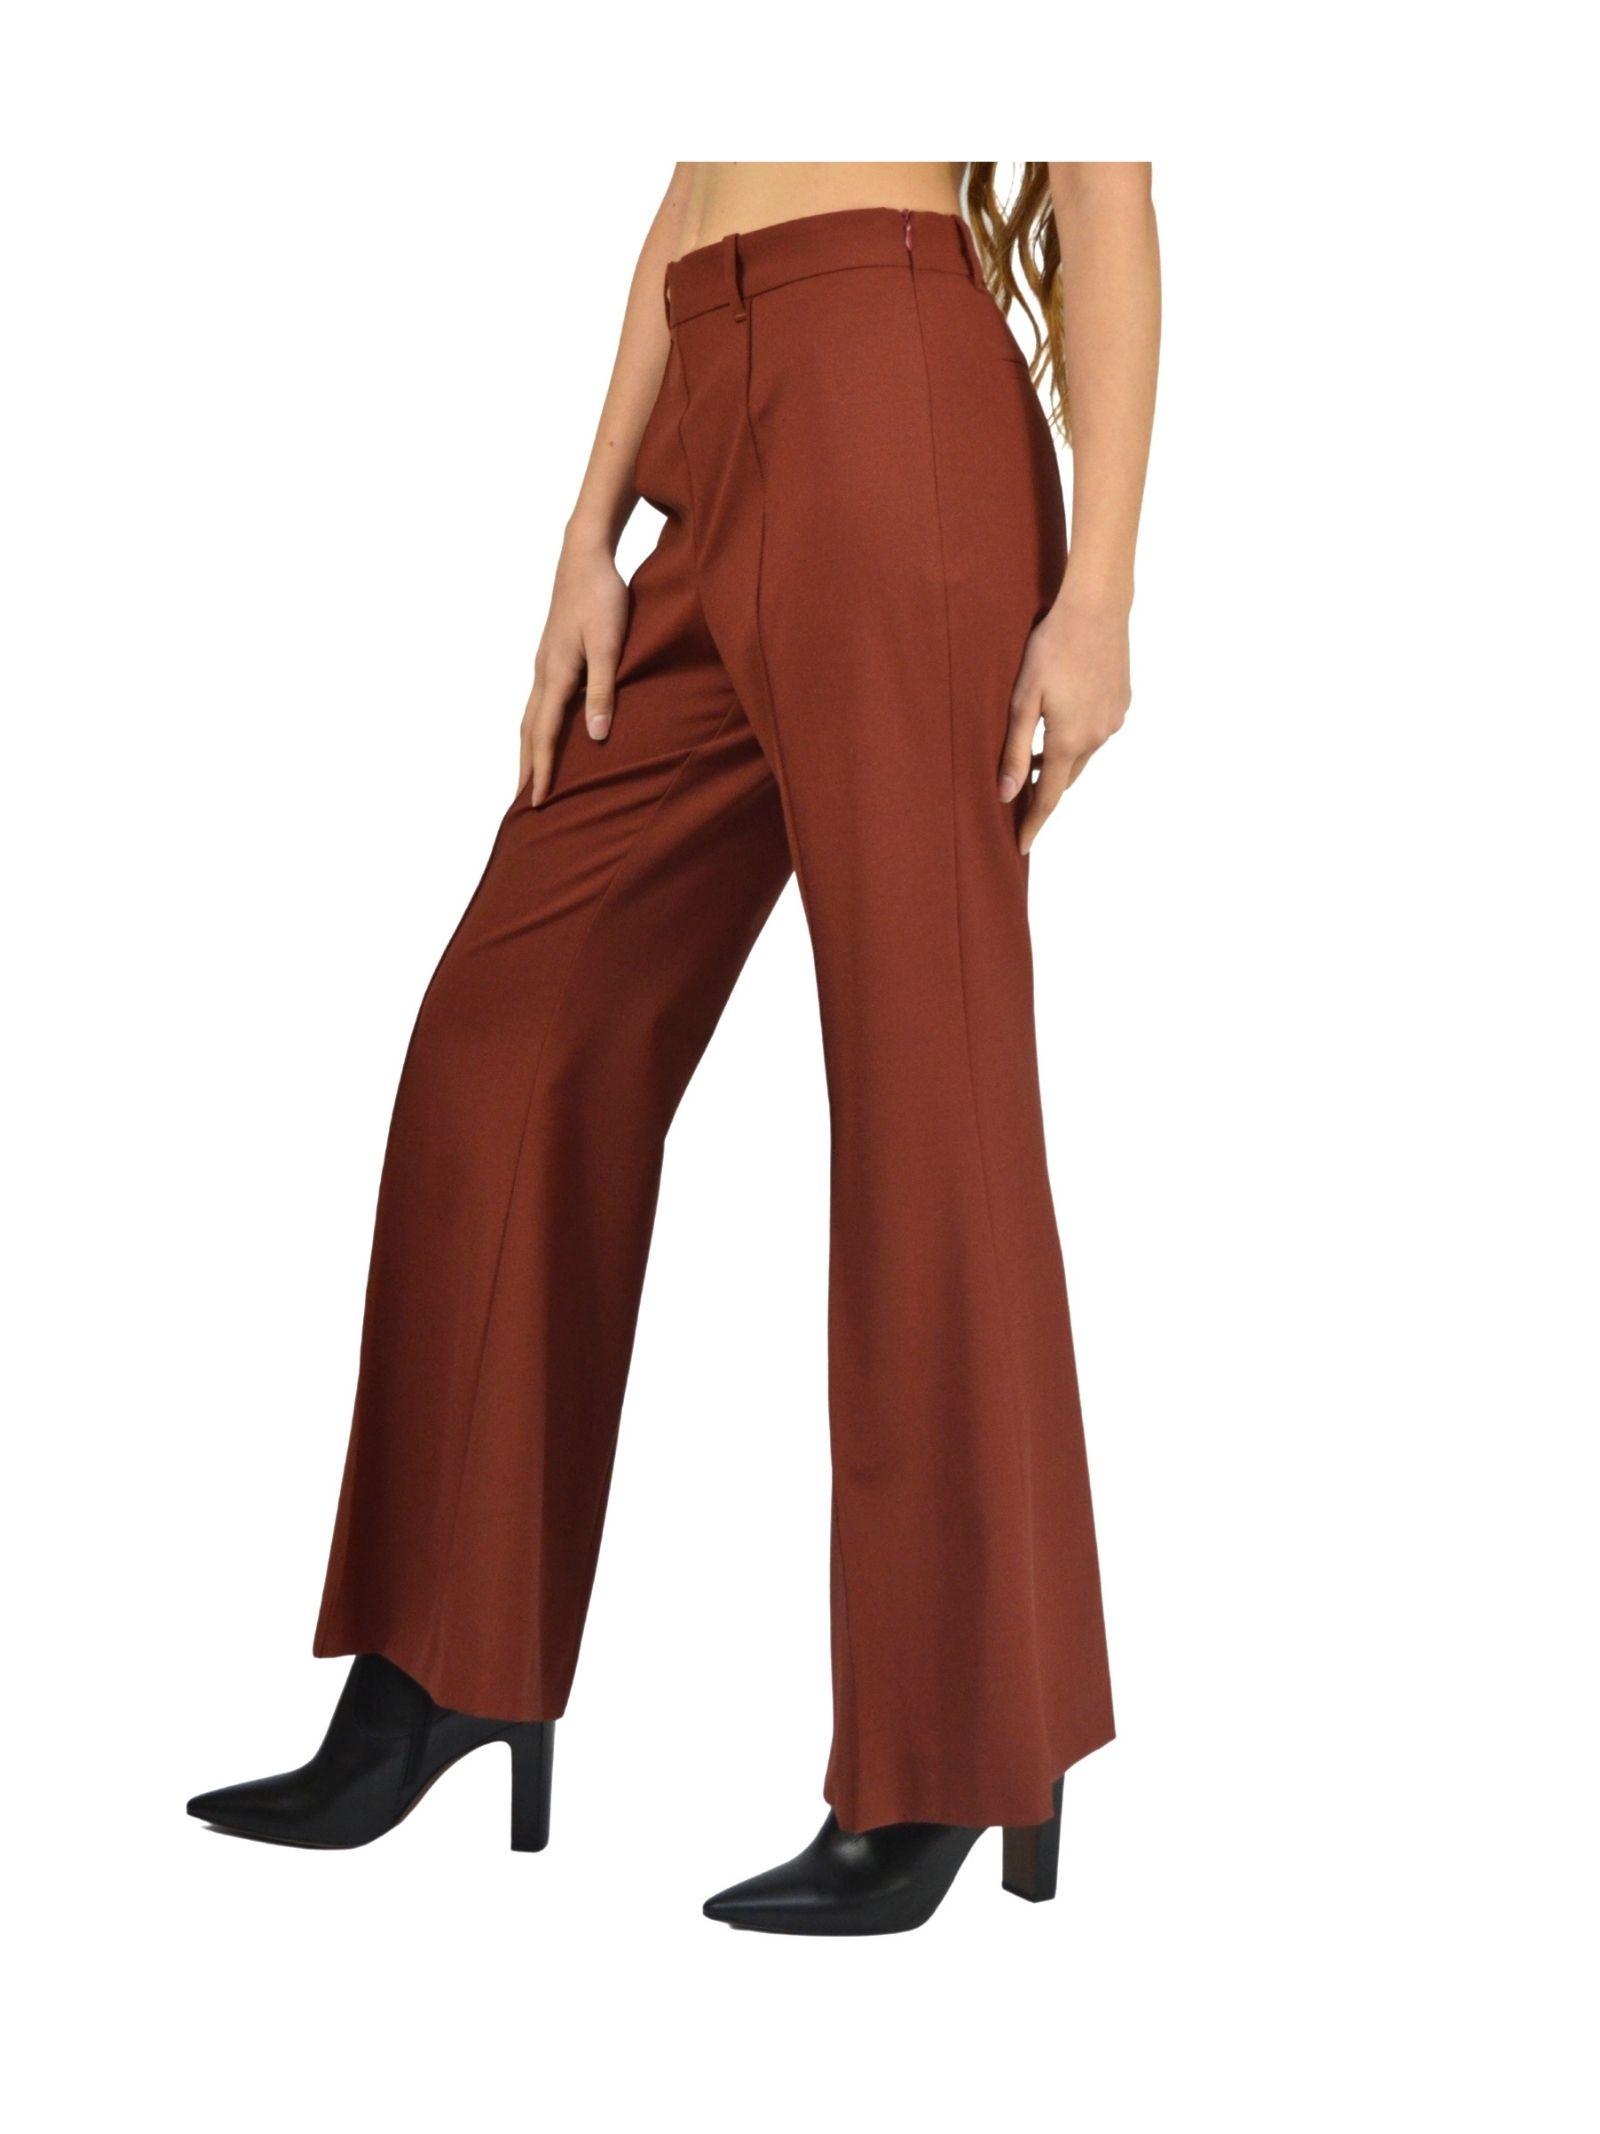 Pantalone Donna Terra Maliparmi | Gonne e Pantaloni | JH74452018841006